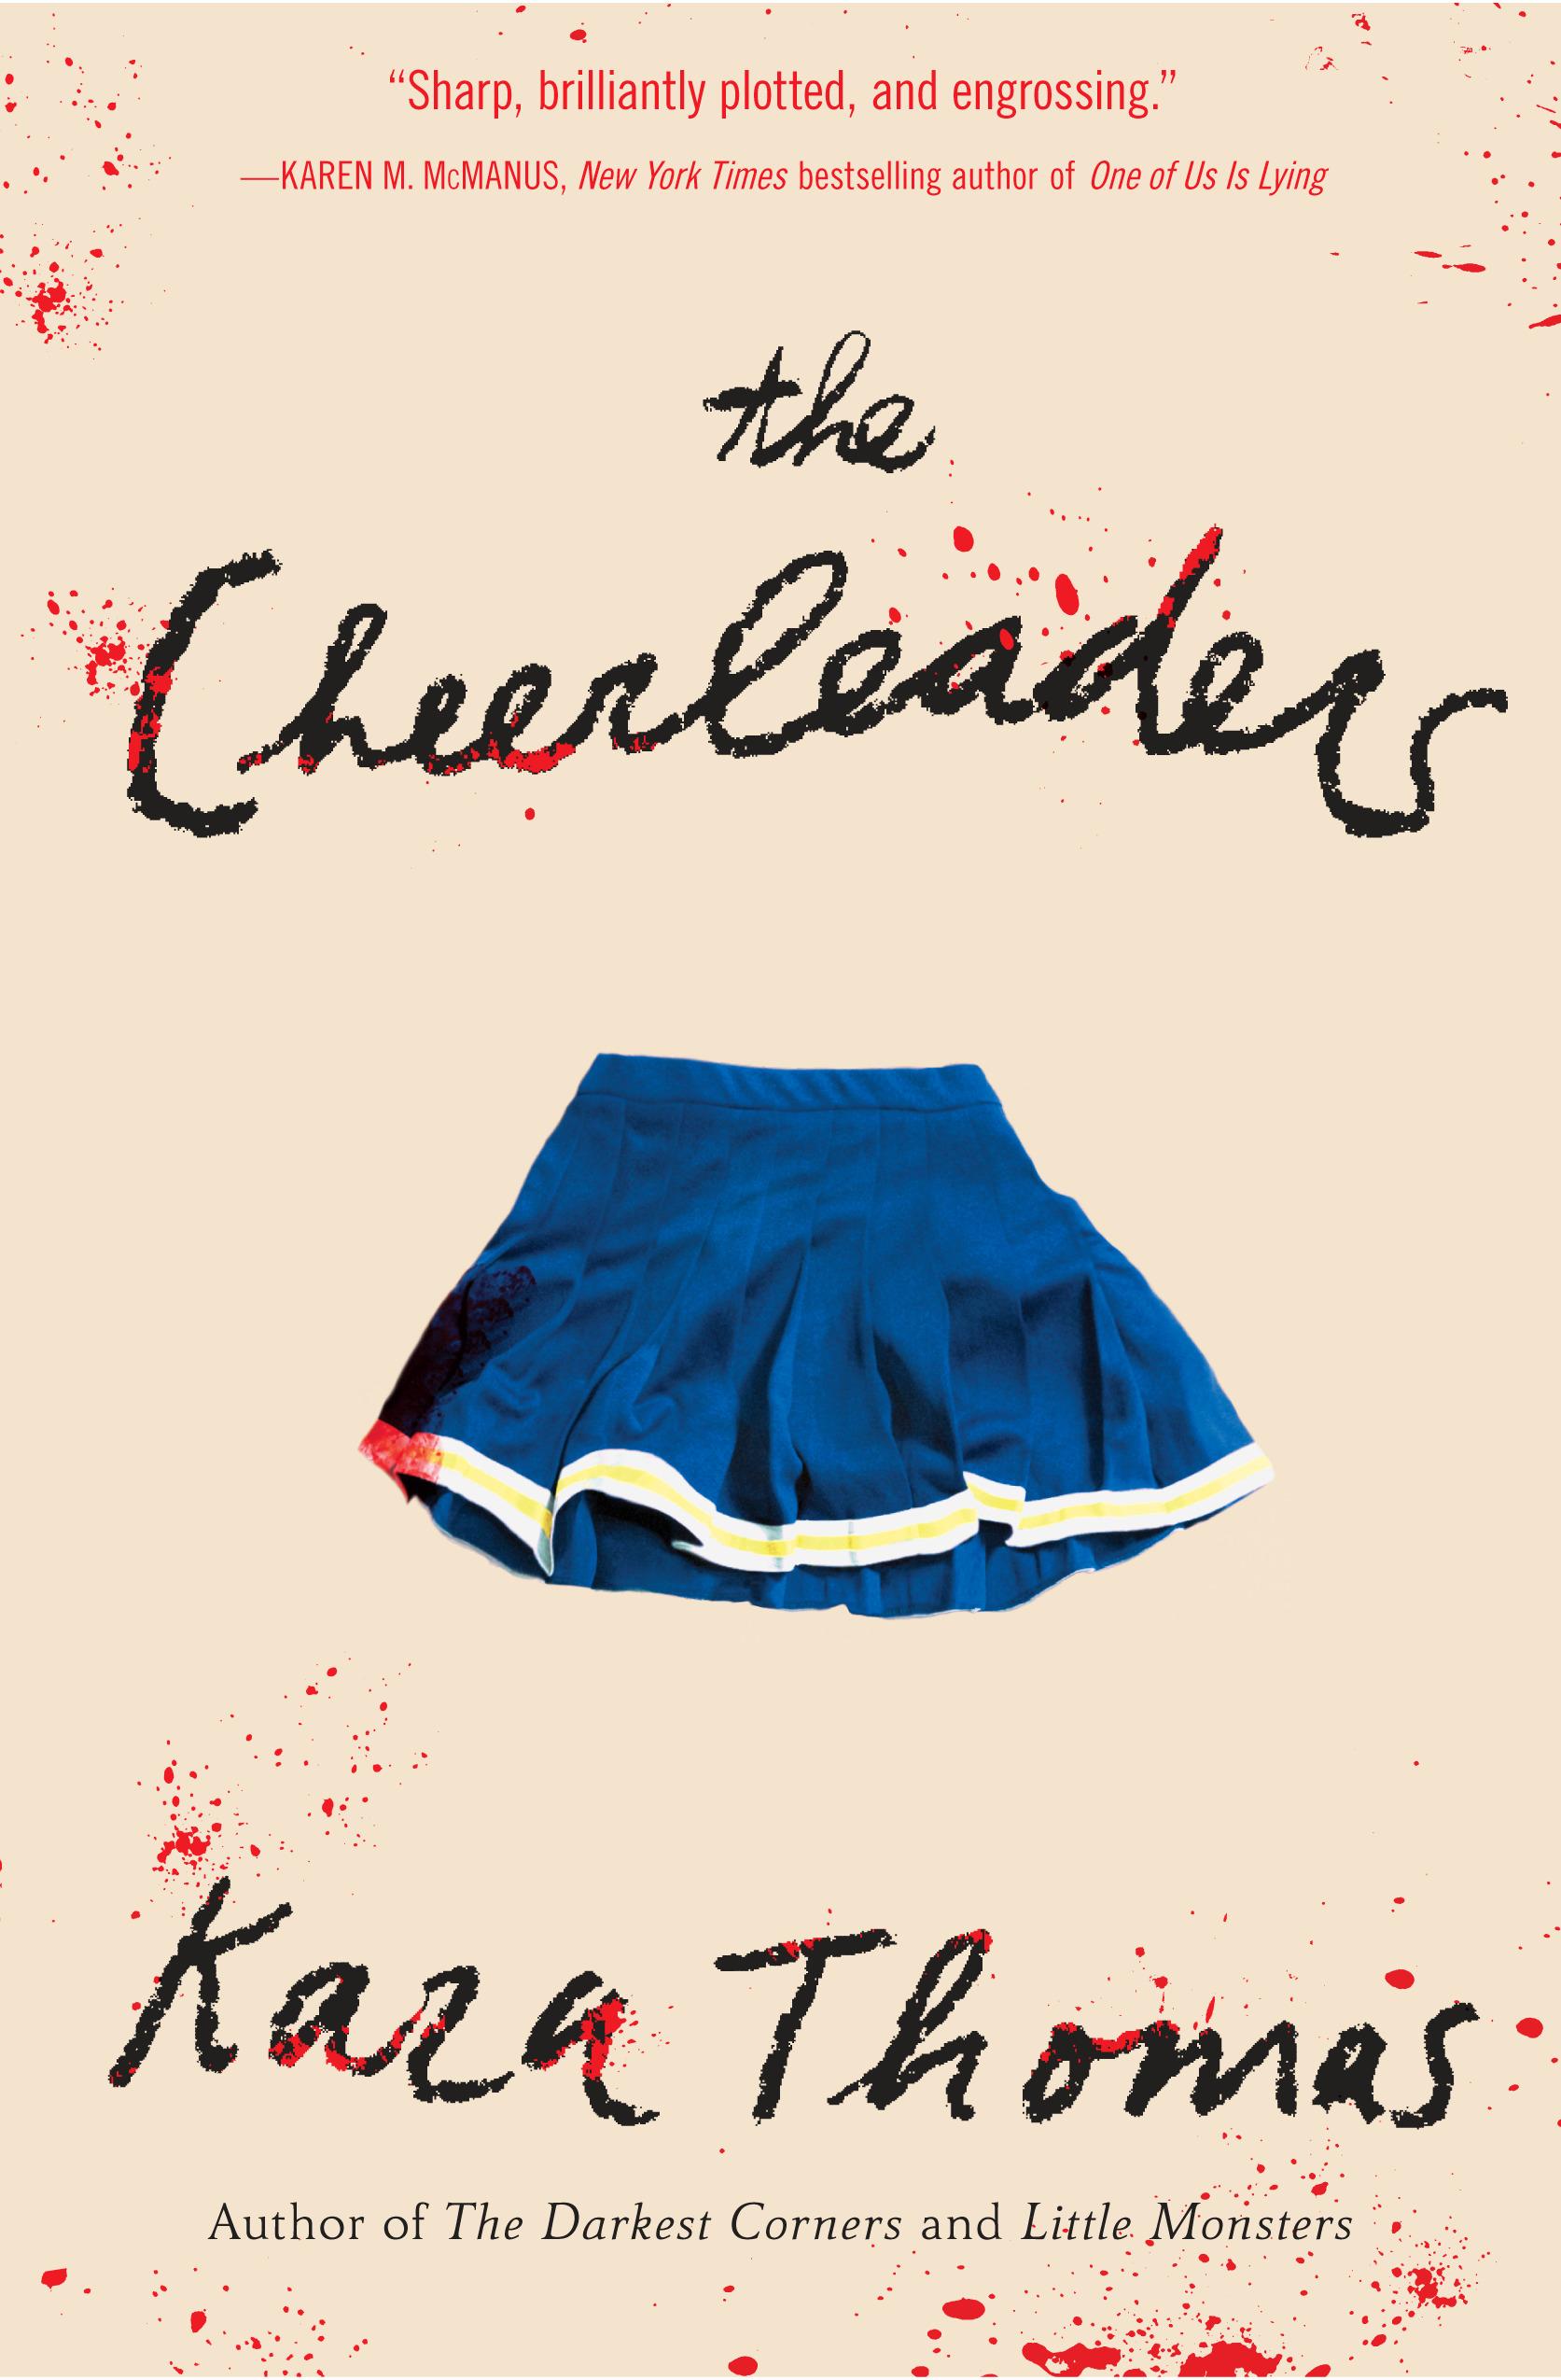 Blog Tour & Giveaway: The Cheerleaders by Kara Thomas